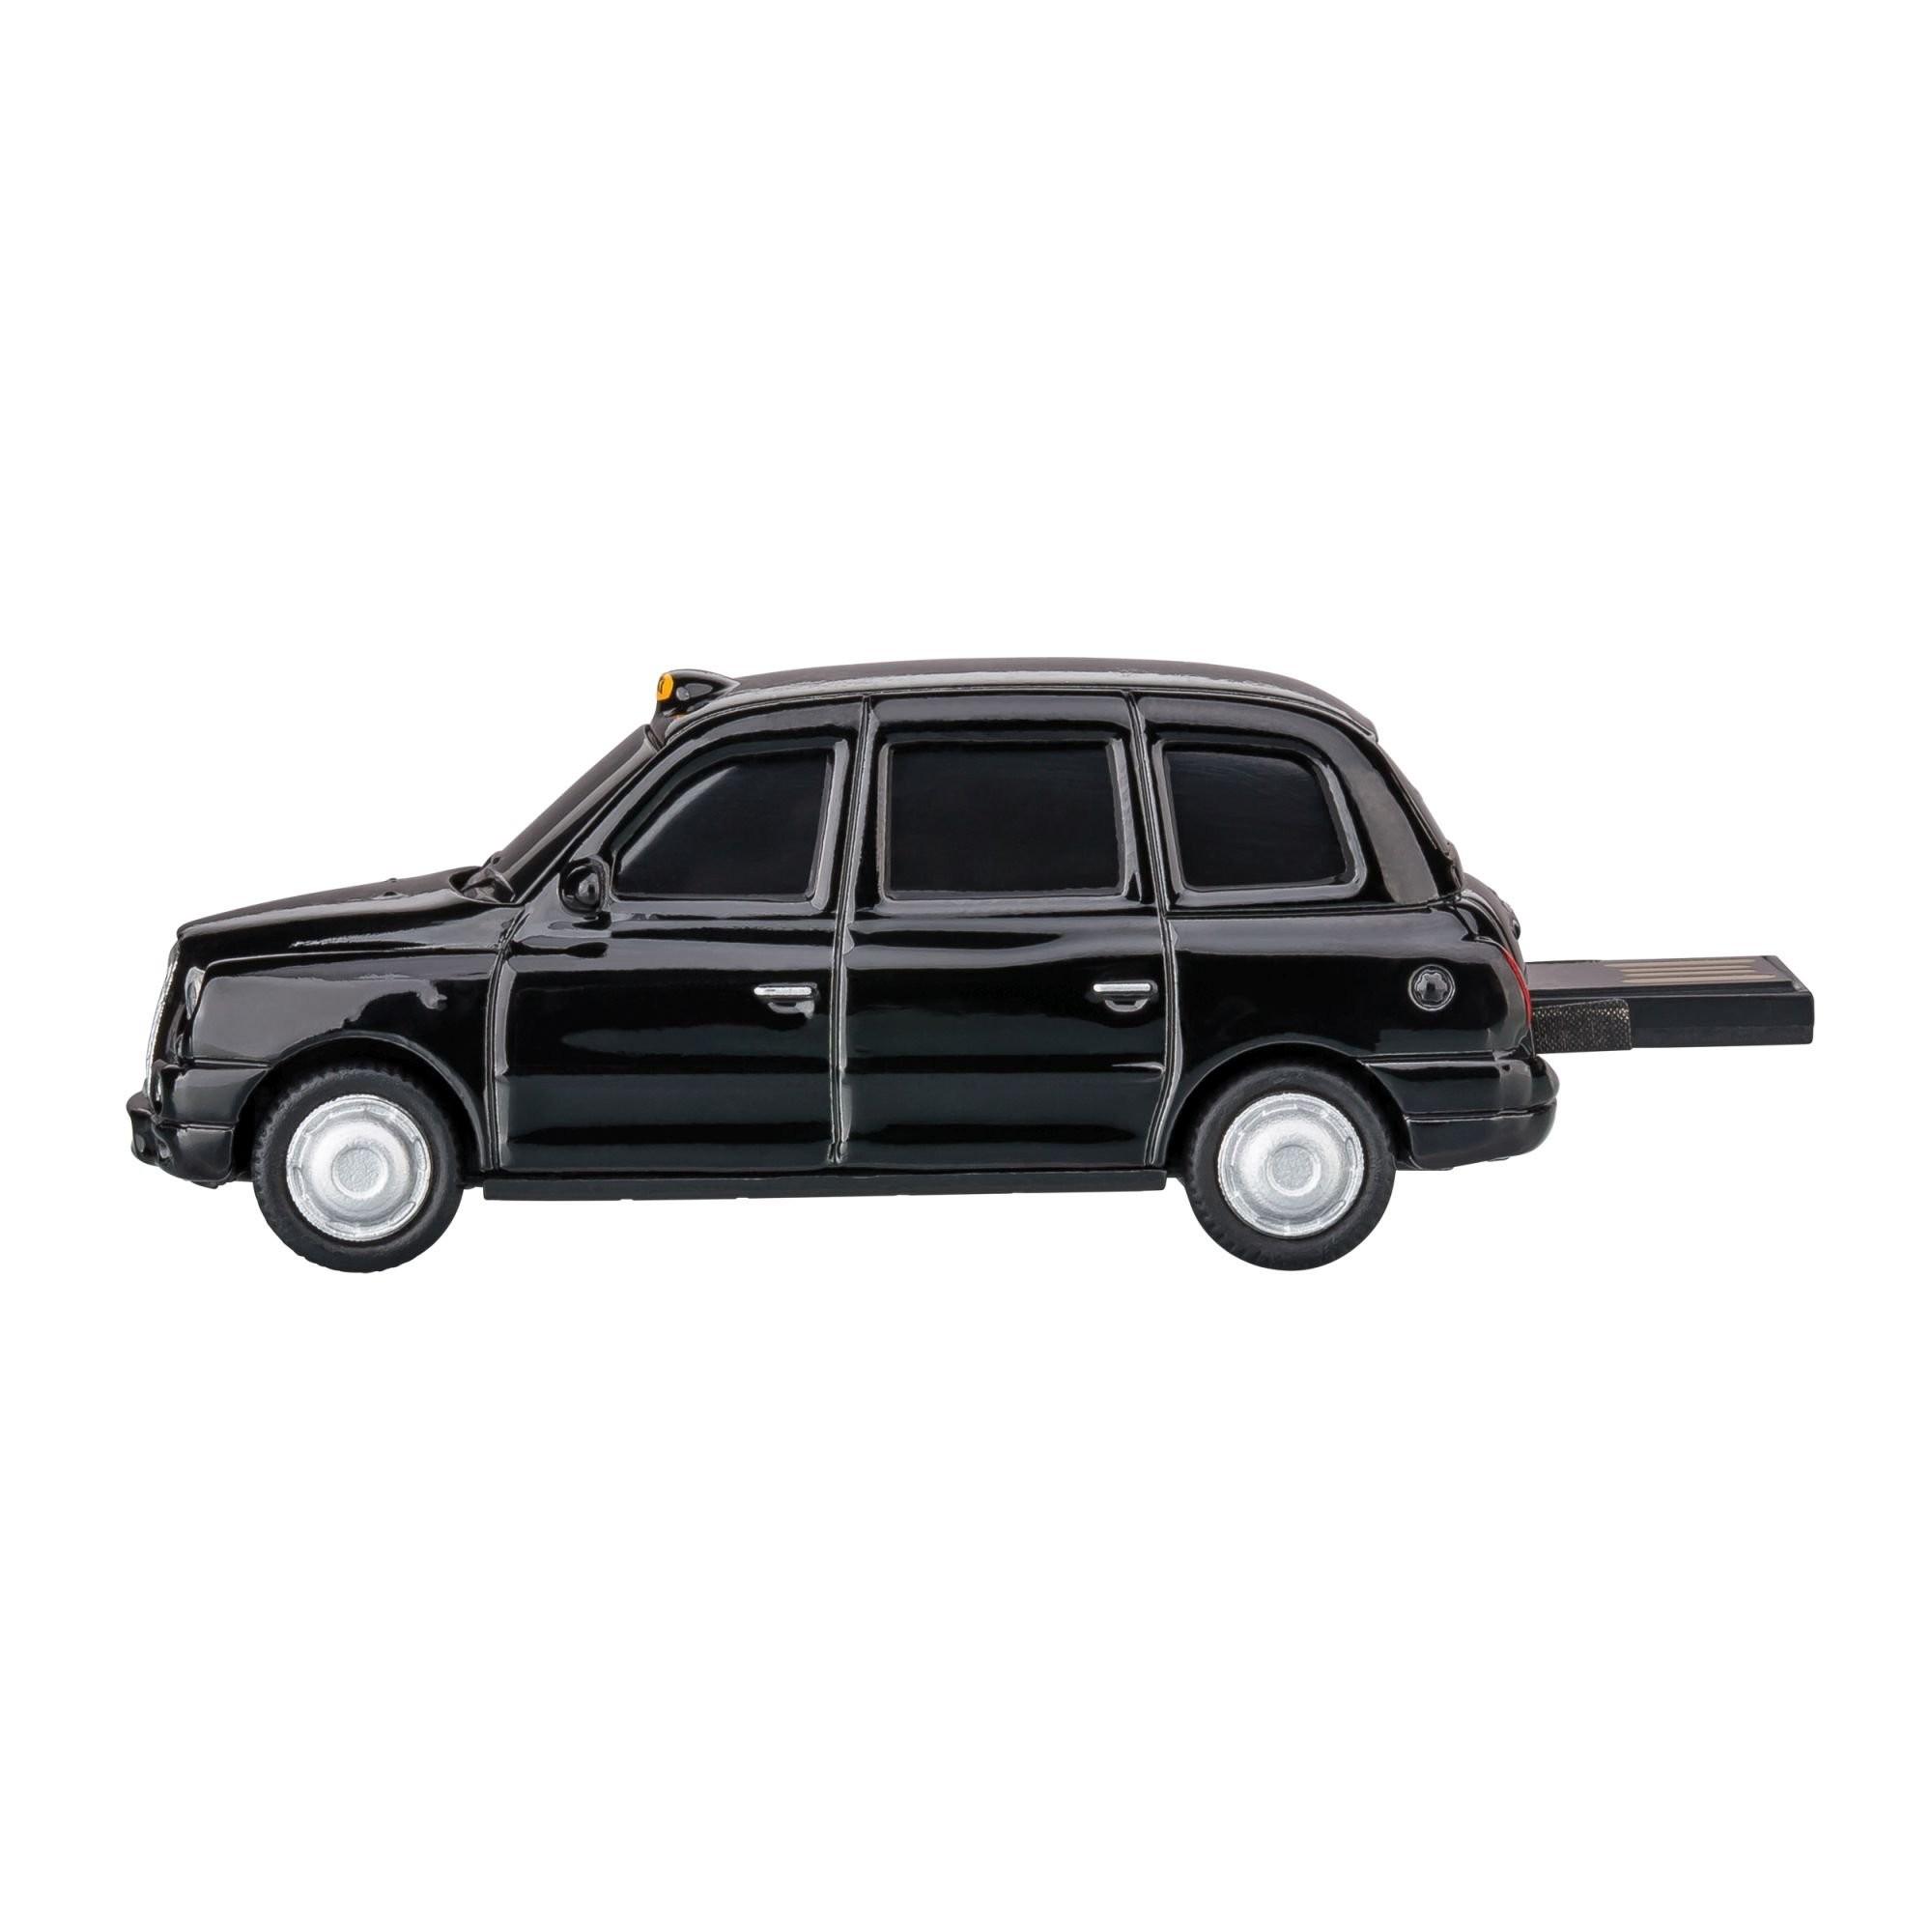 USB-Speicherstick London Taxi TX4 1:72 BLACK 16GB, Ansicht 4